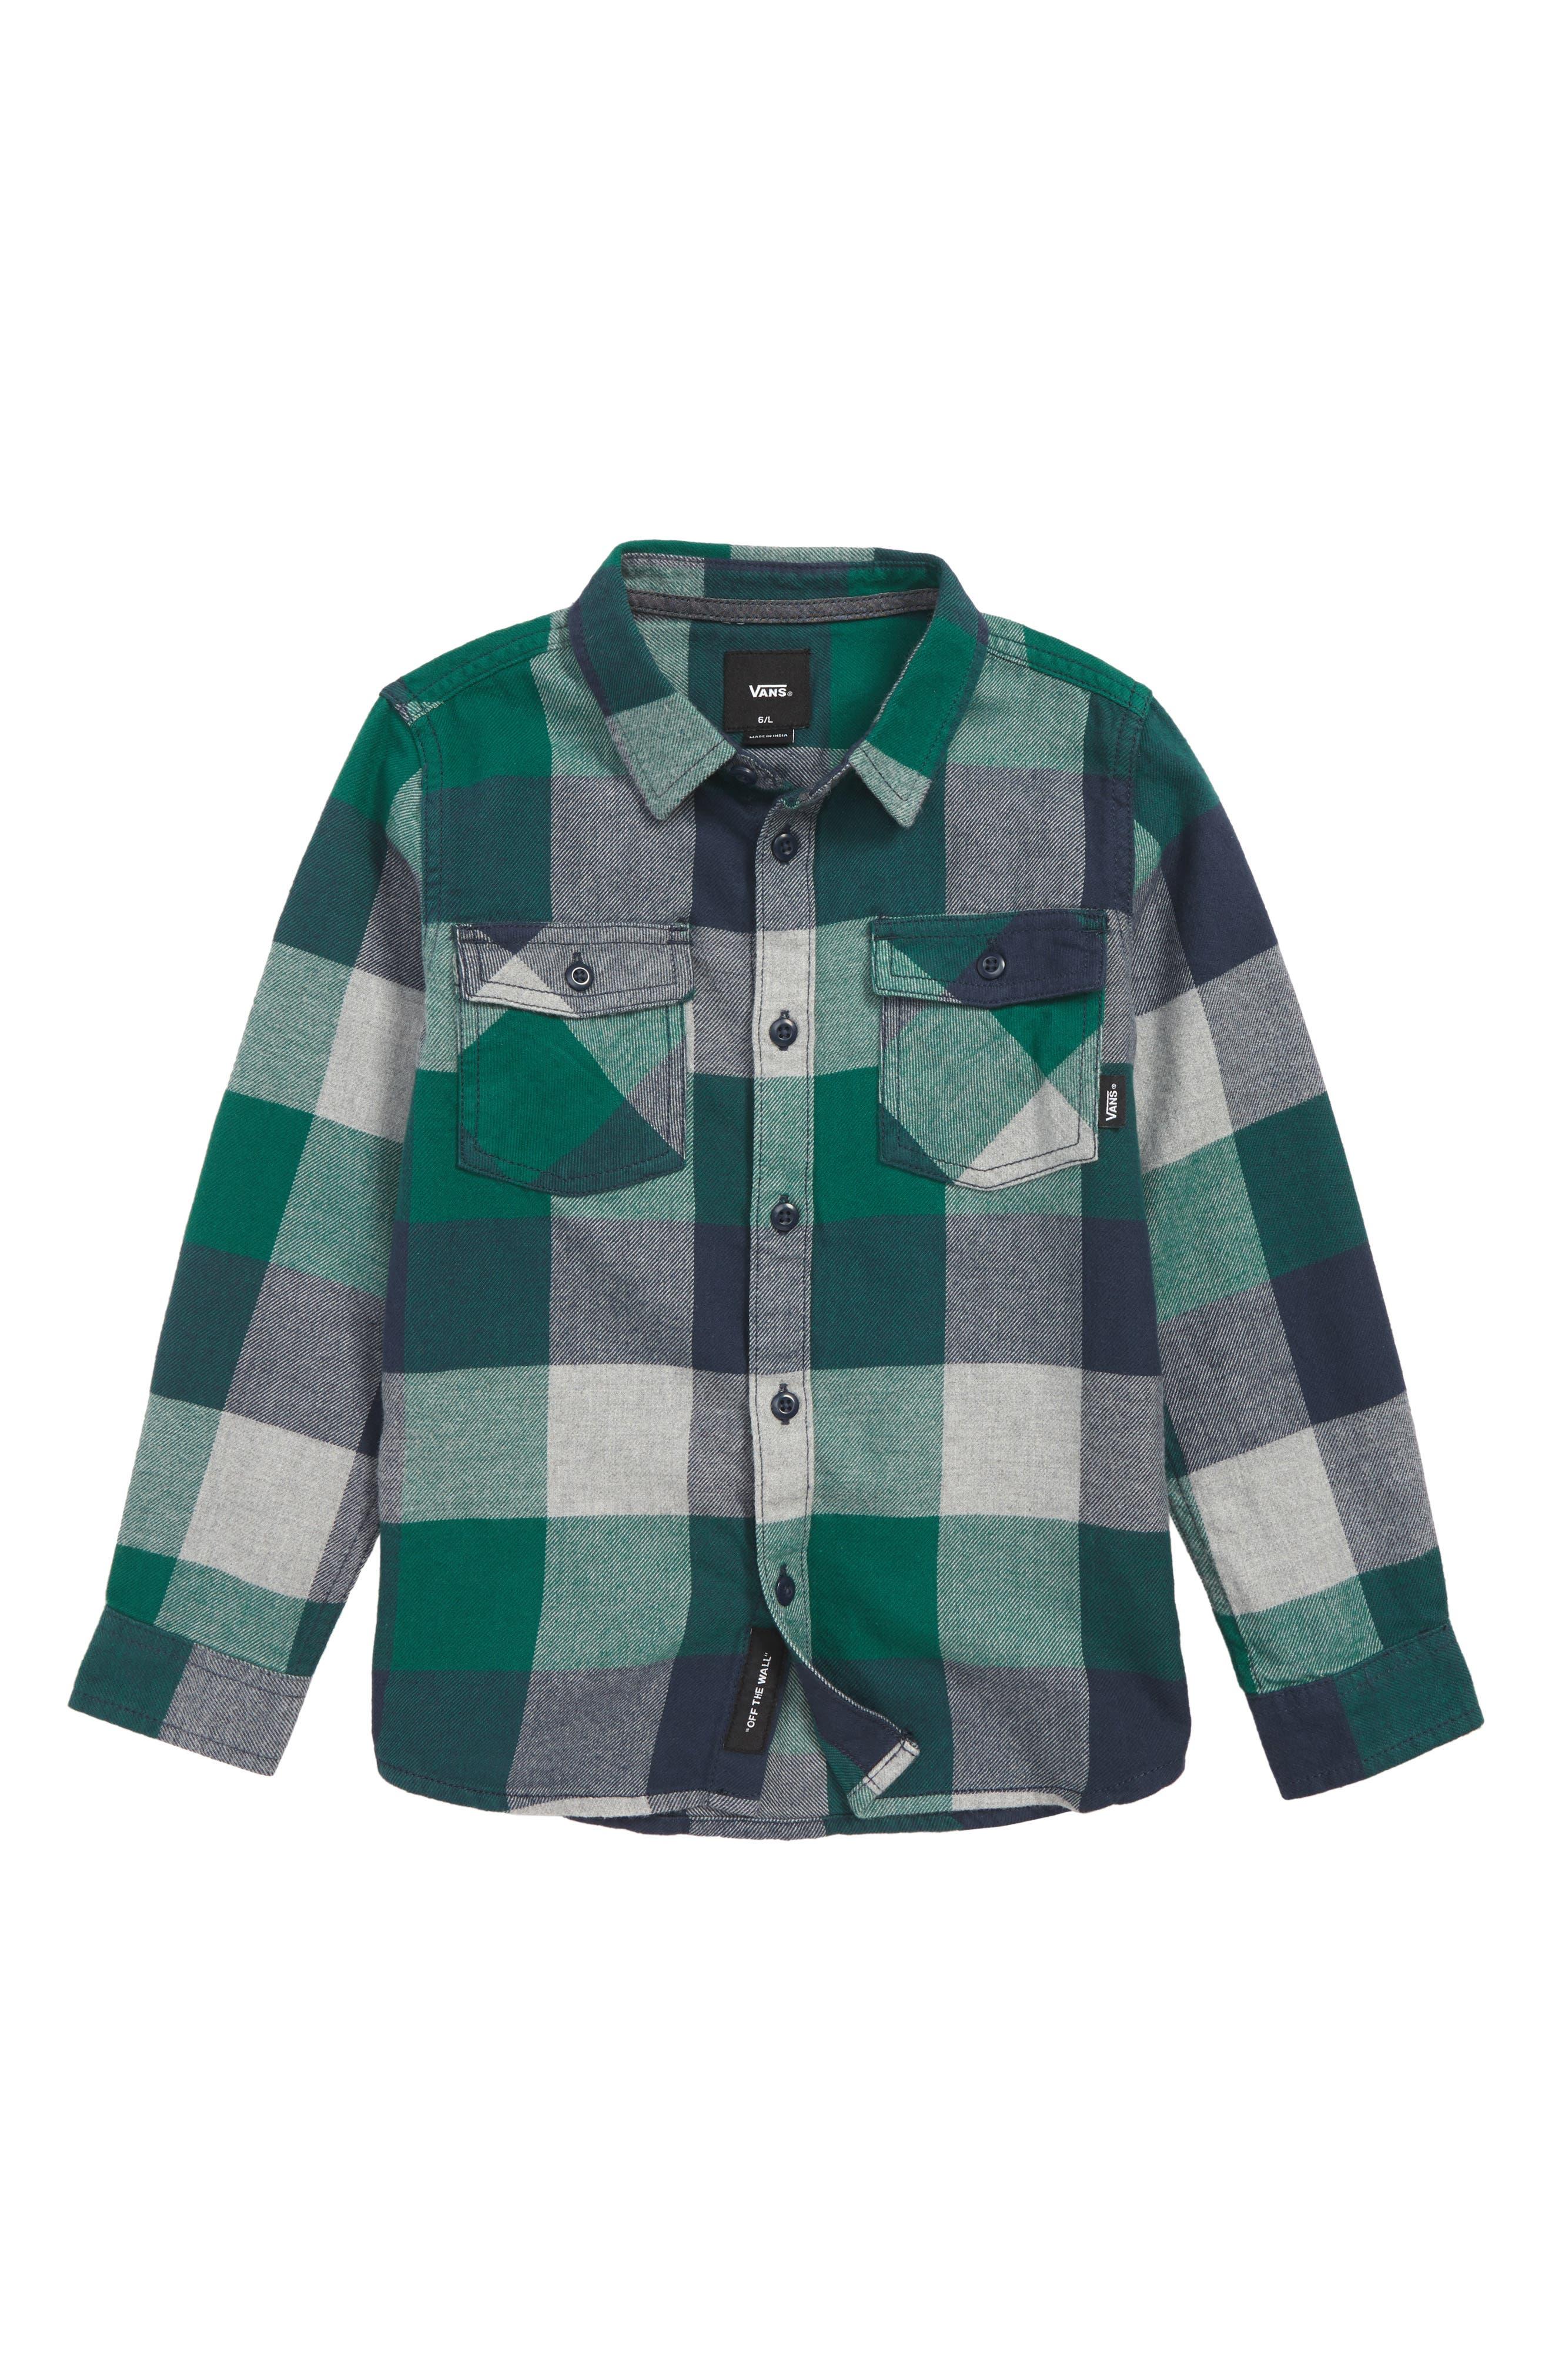 Box Check Flannel Shirt, Main, color, 310